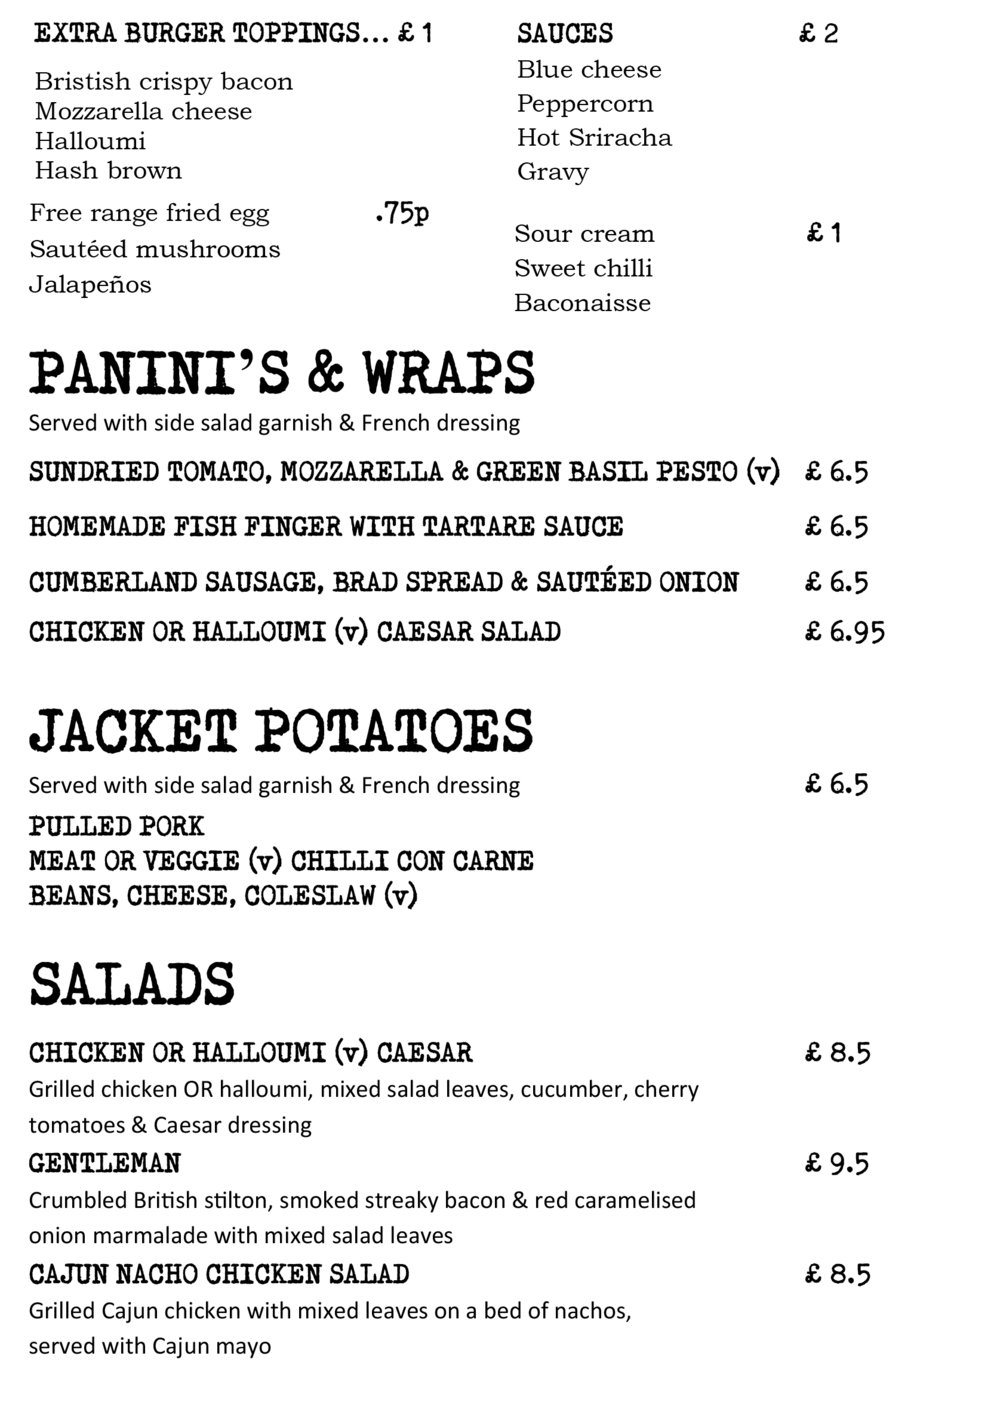 BBK Menu Spring 2018 no 2.png